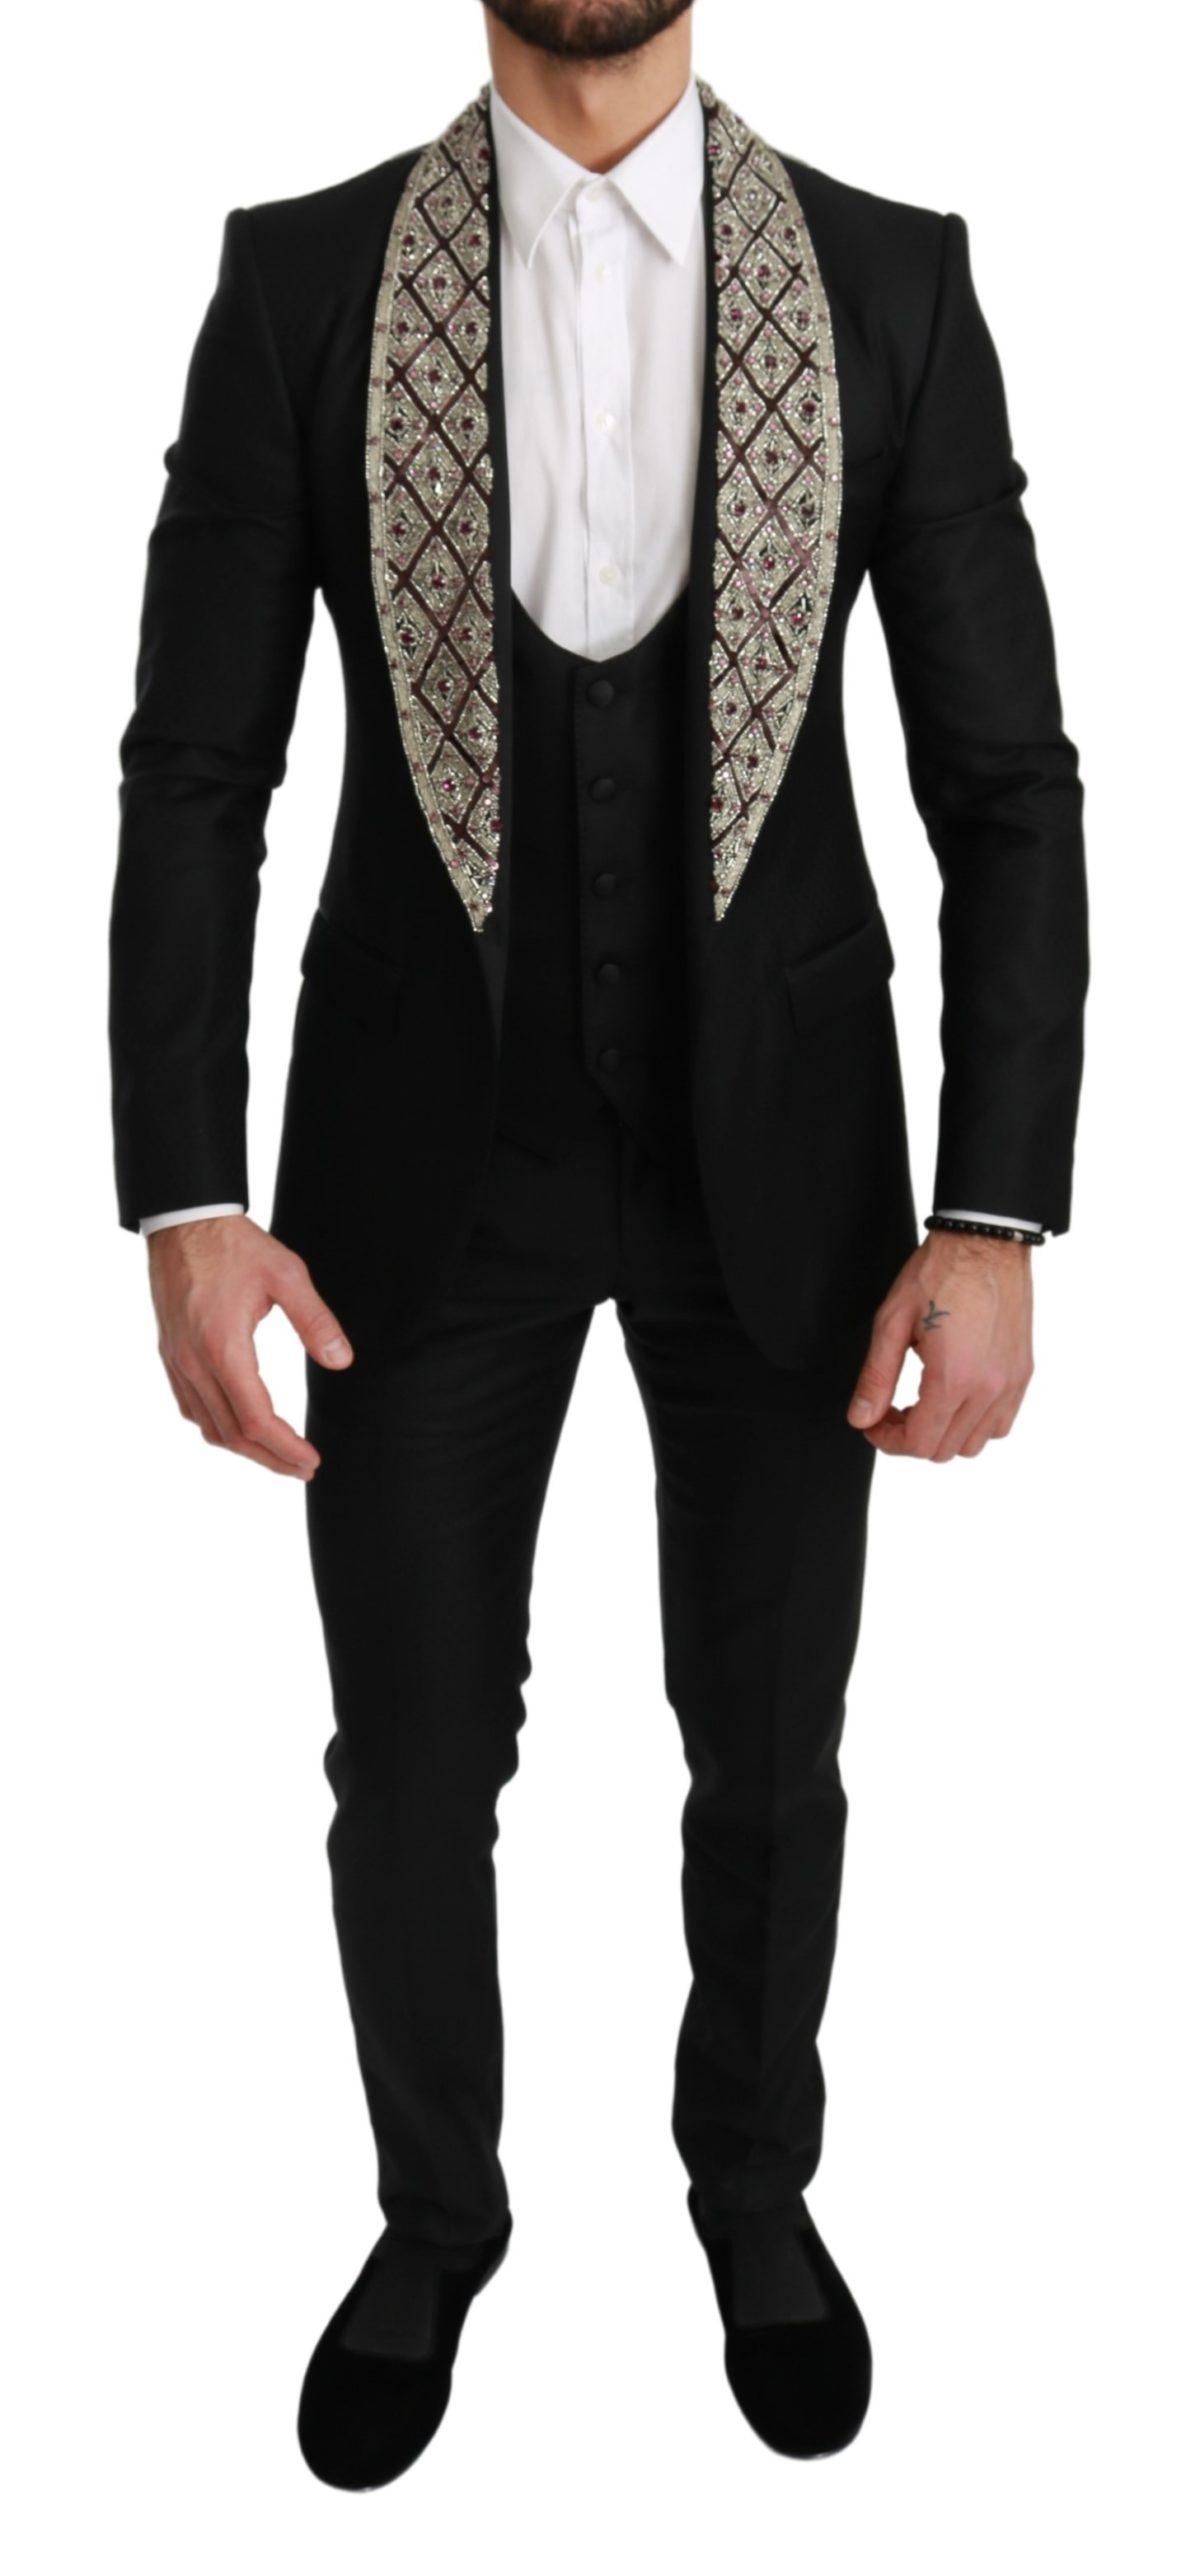 Dolce & Gabbana Men's Crystal Wool 3 Piece SICILIA Suit Black KOS1719 - IT44 | XS